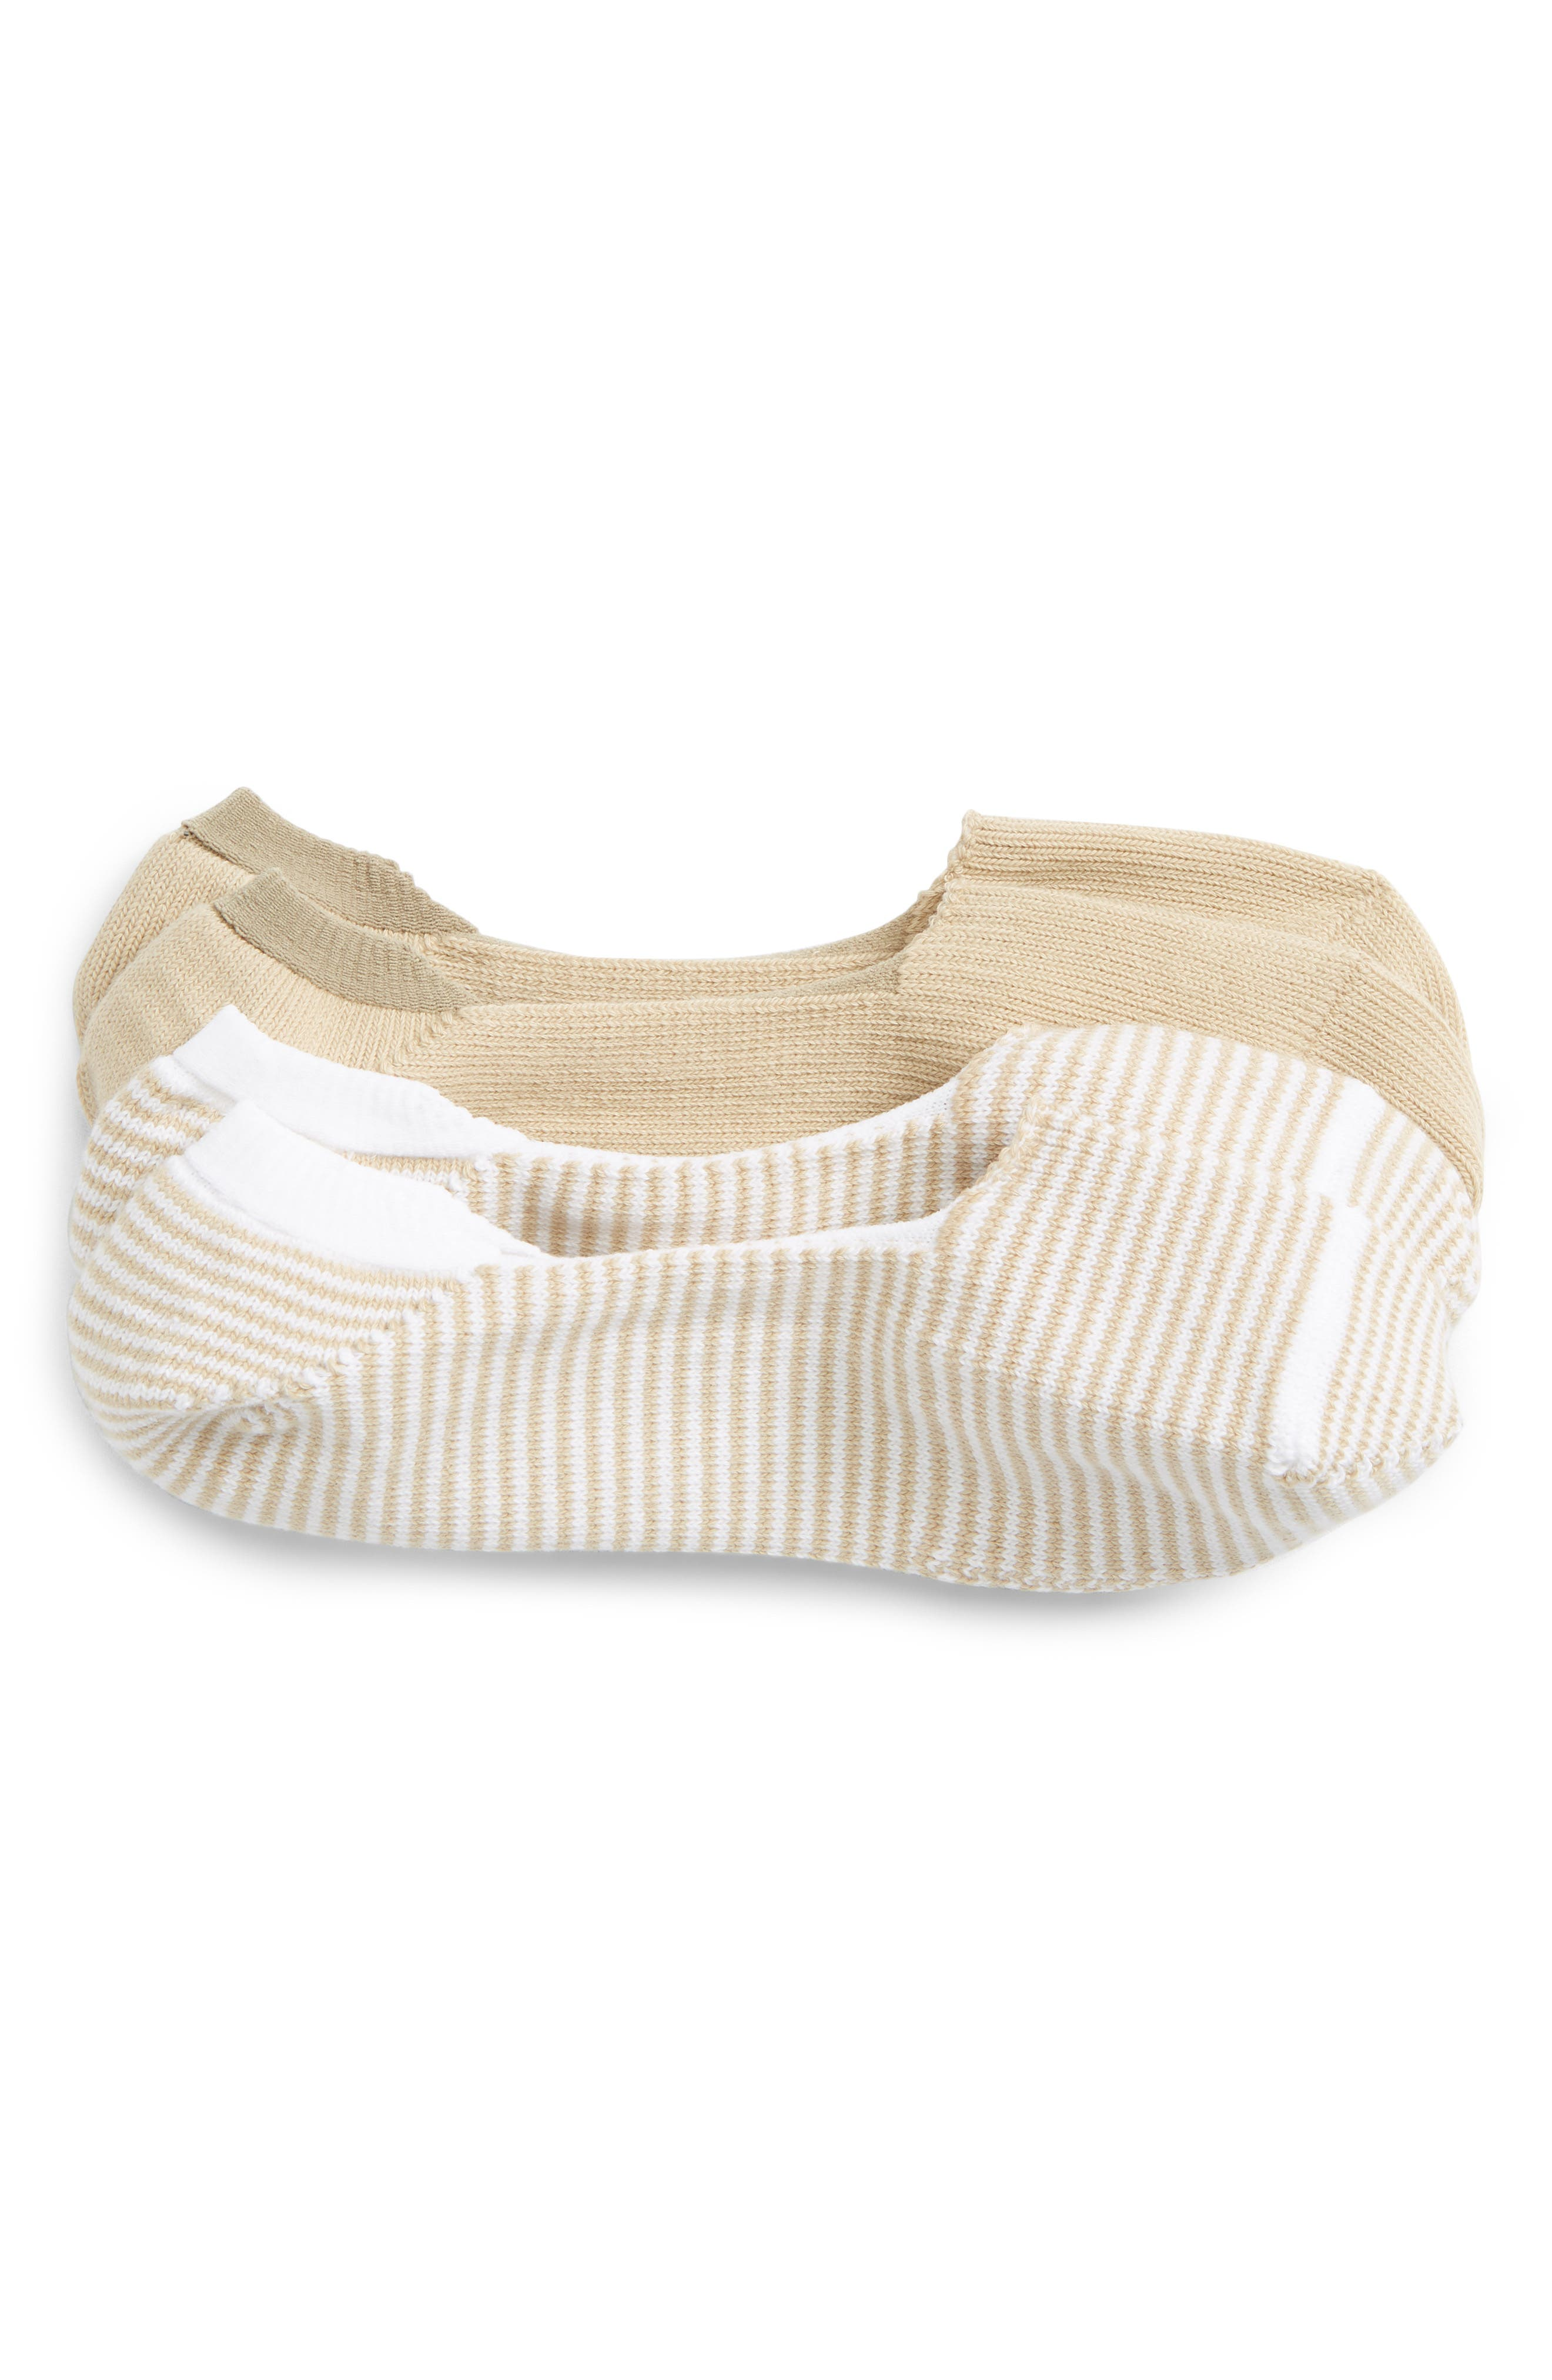 2-Pack Liner Socks,                             Main thumbnail 1, color,                             Tan Nomad/ White